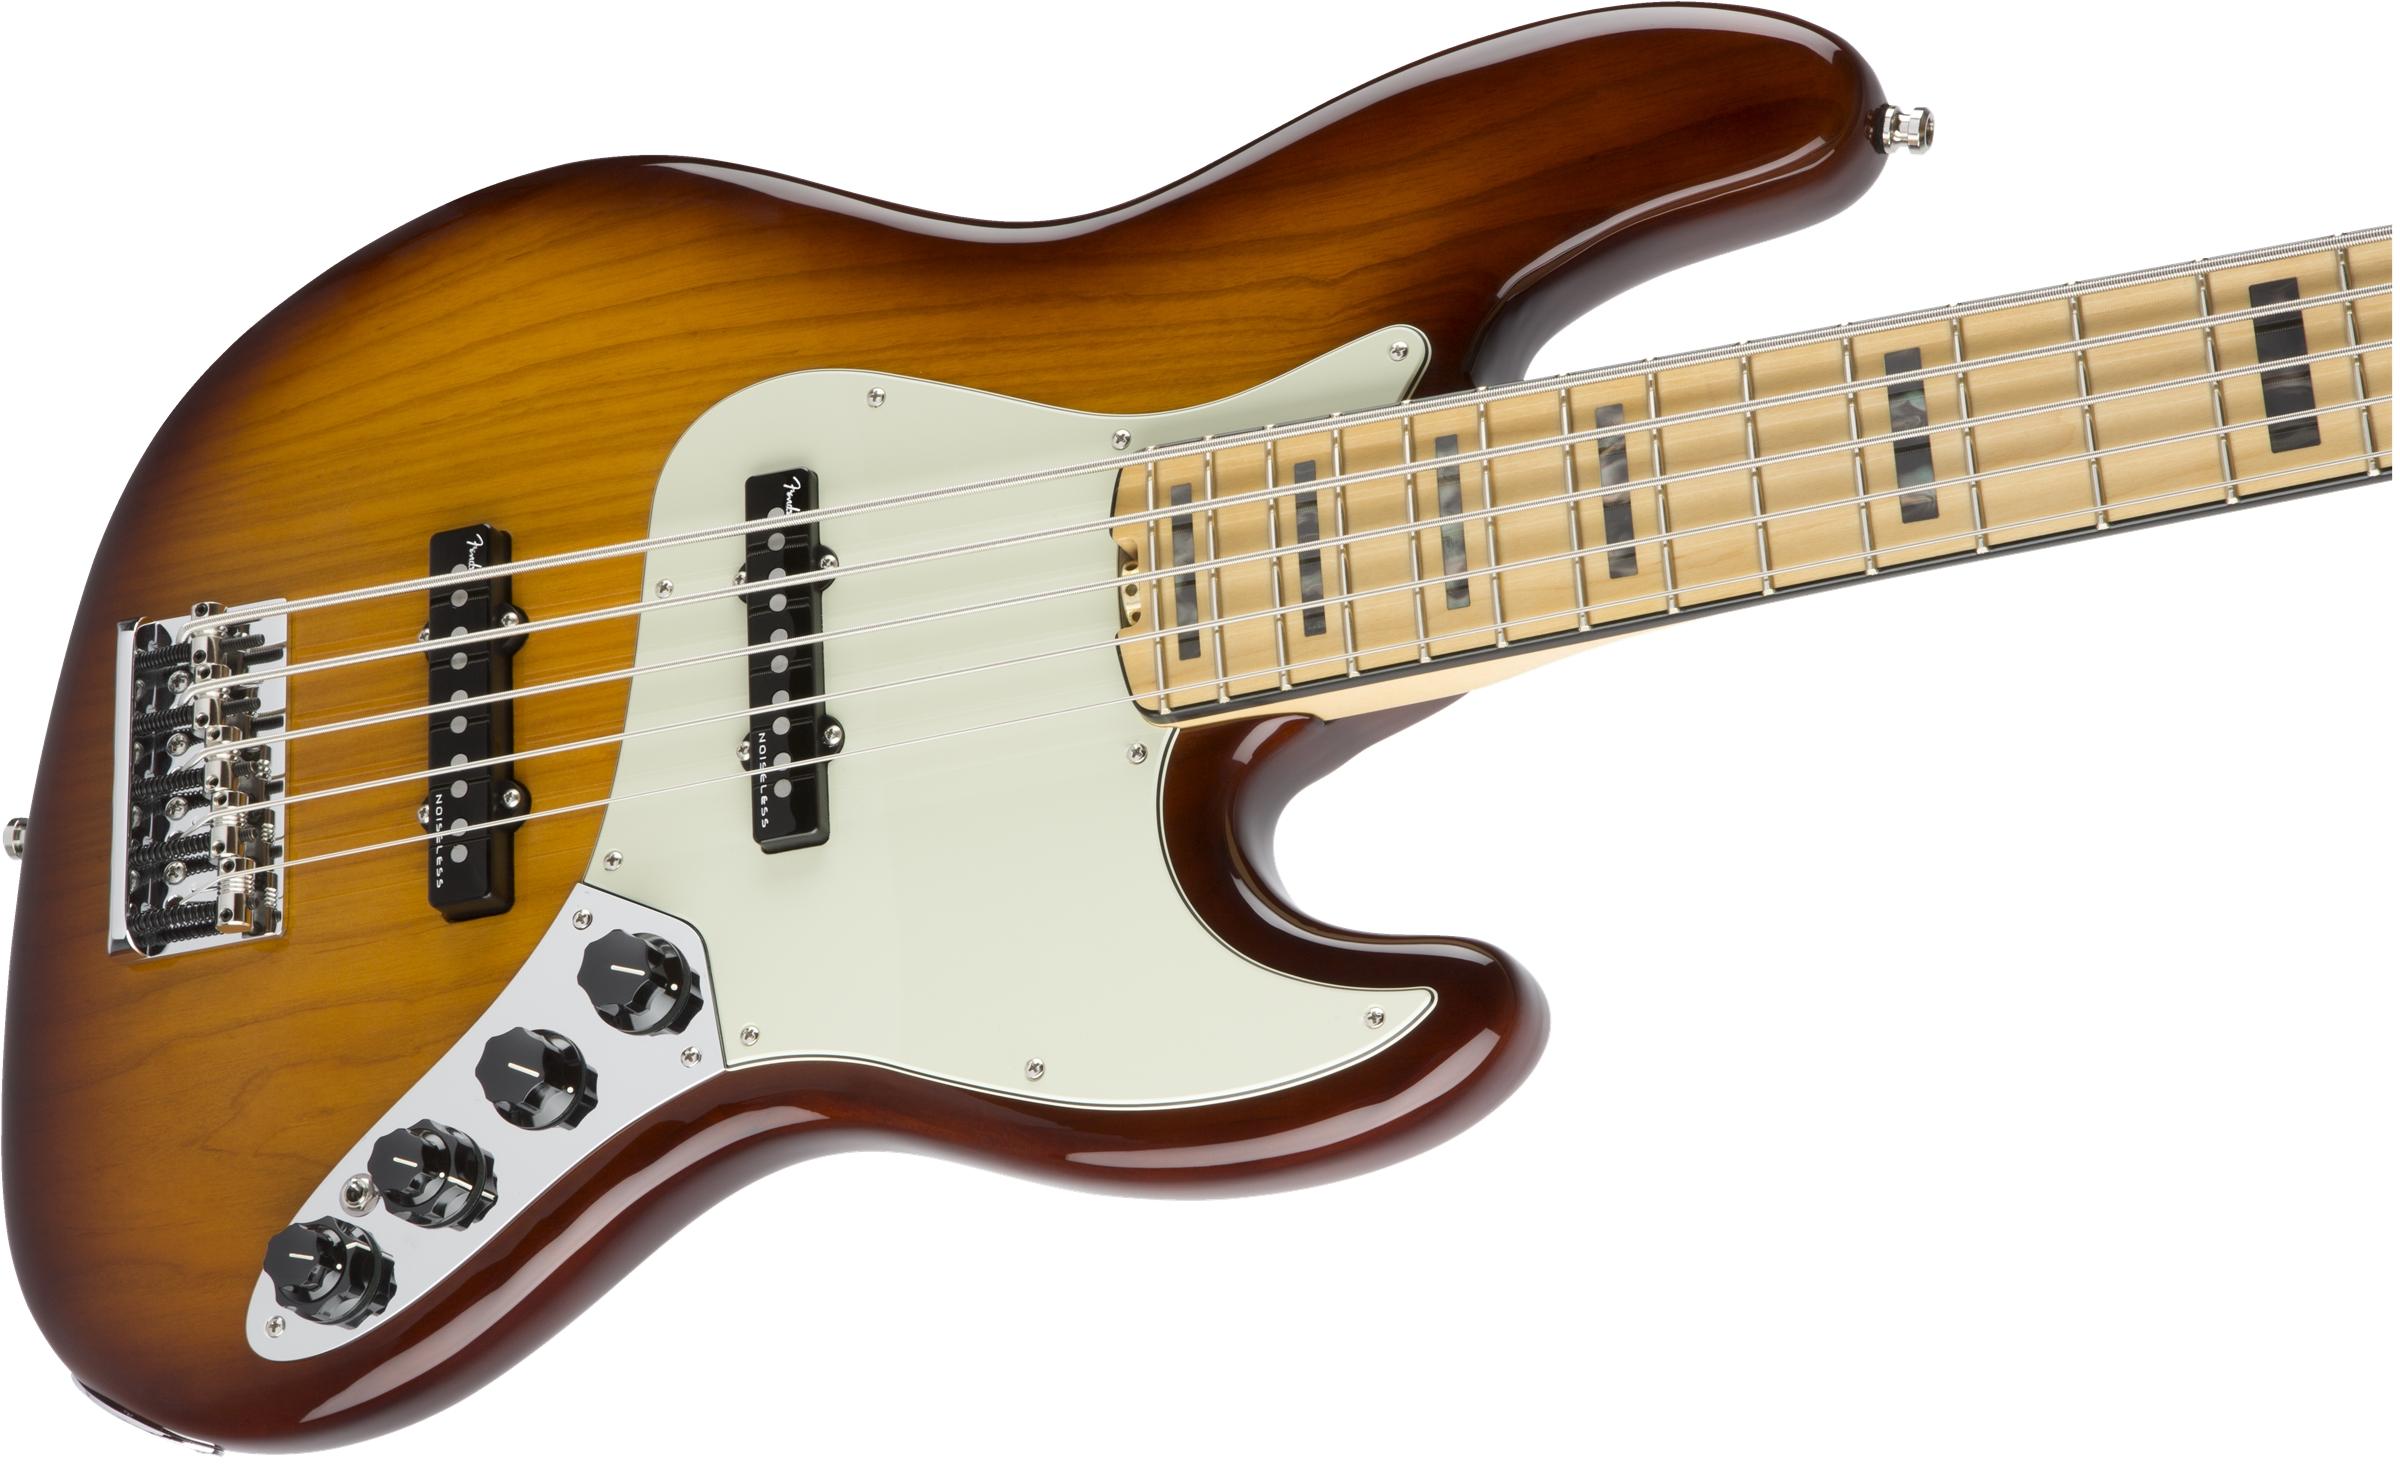 Fender American Elite Jazz Bass® V Tobacco Sunburst Maple Fingerboard Electric Bass Guitar